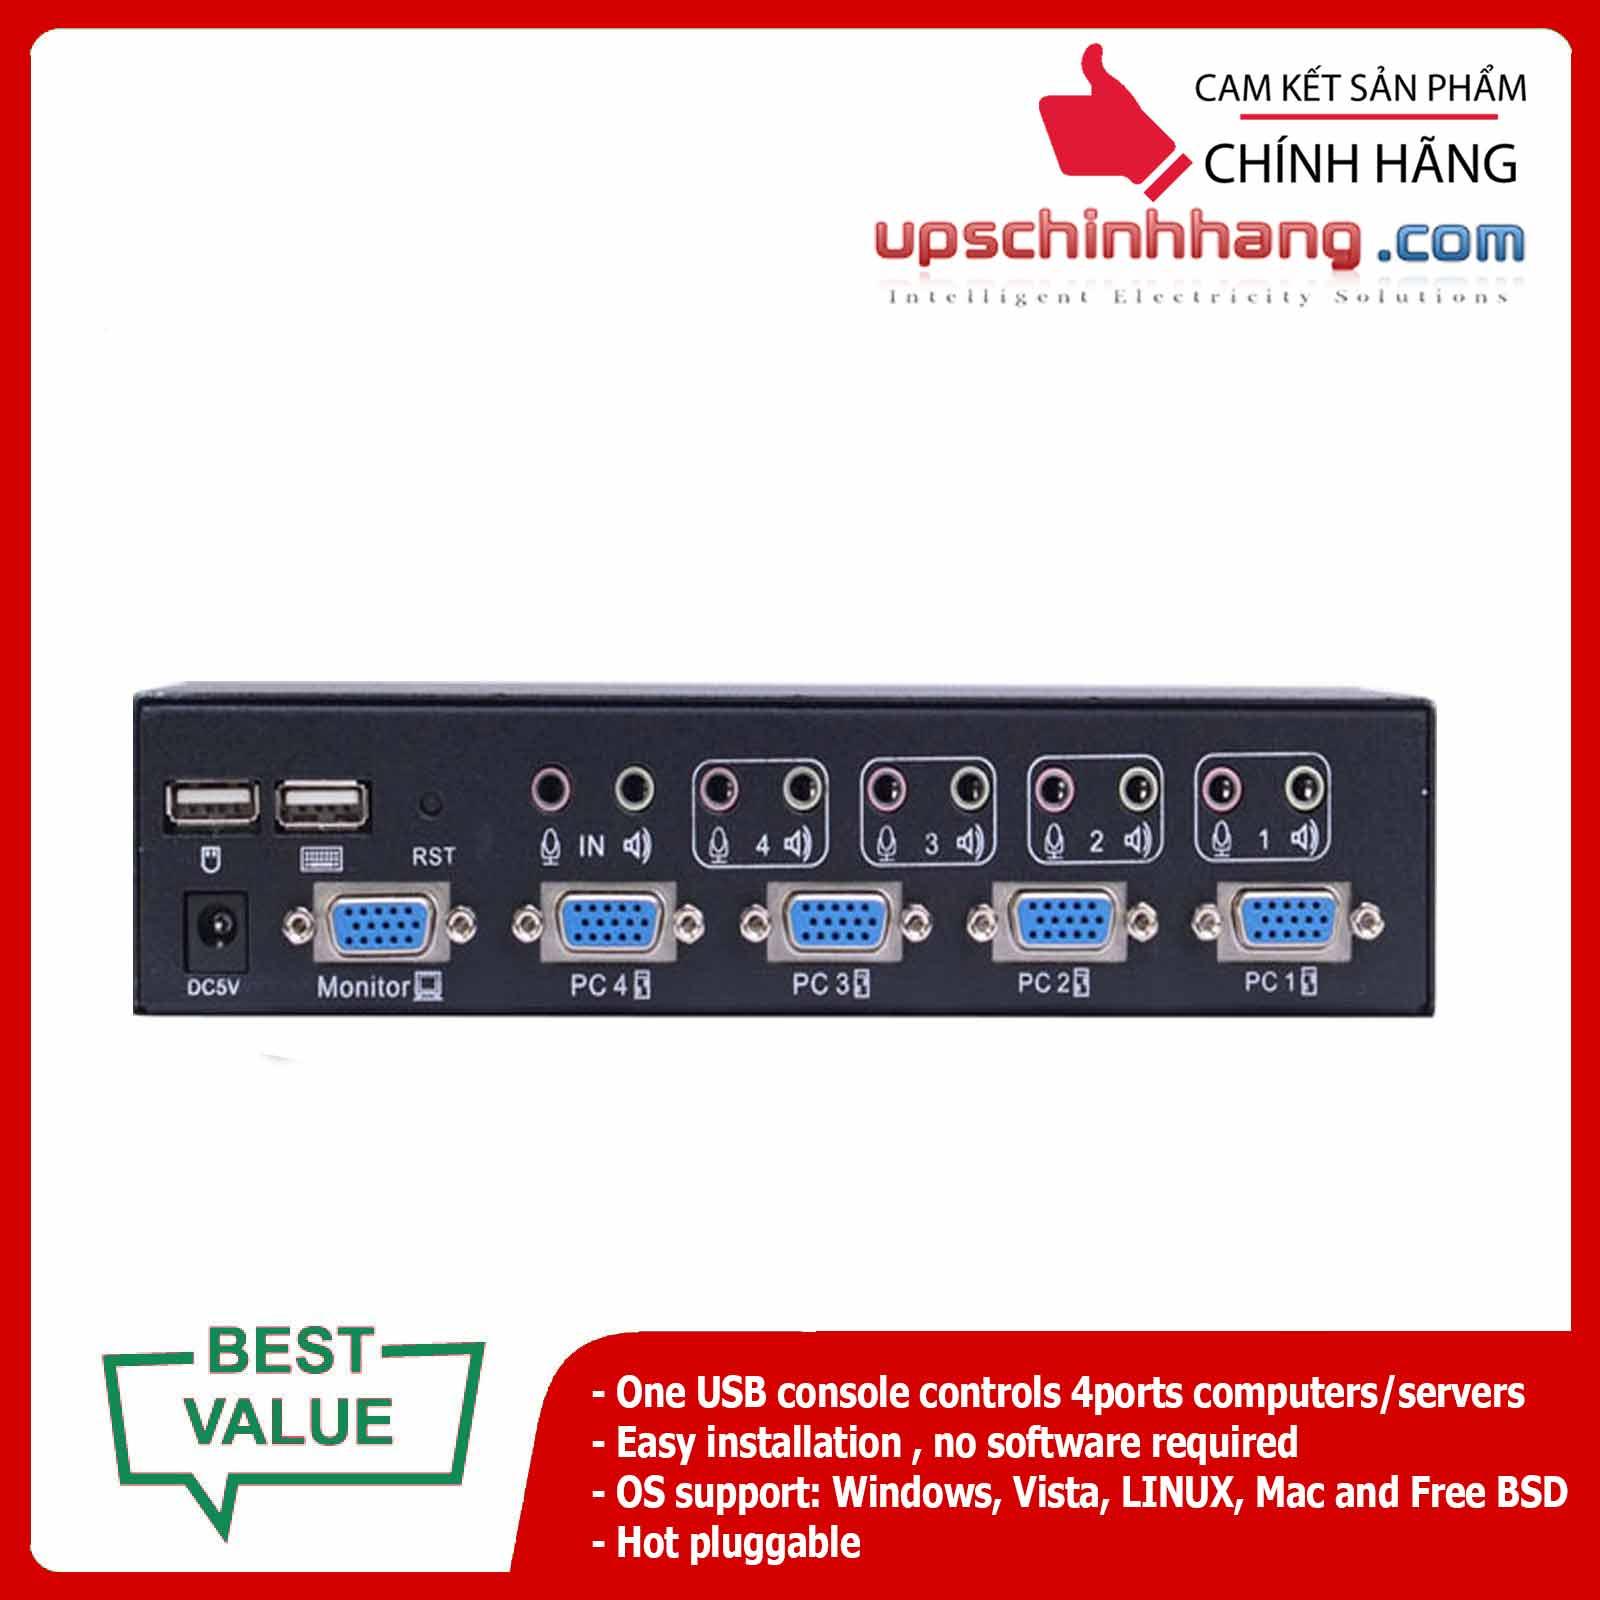 ANGUSTOS AD-V41L - Desktop - 4 Port VGA KVM Switch